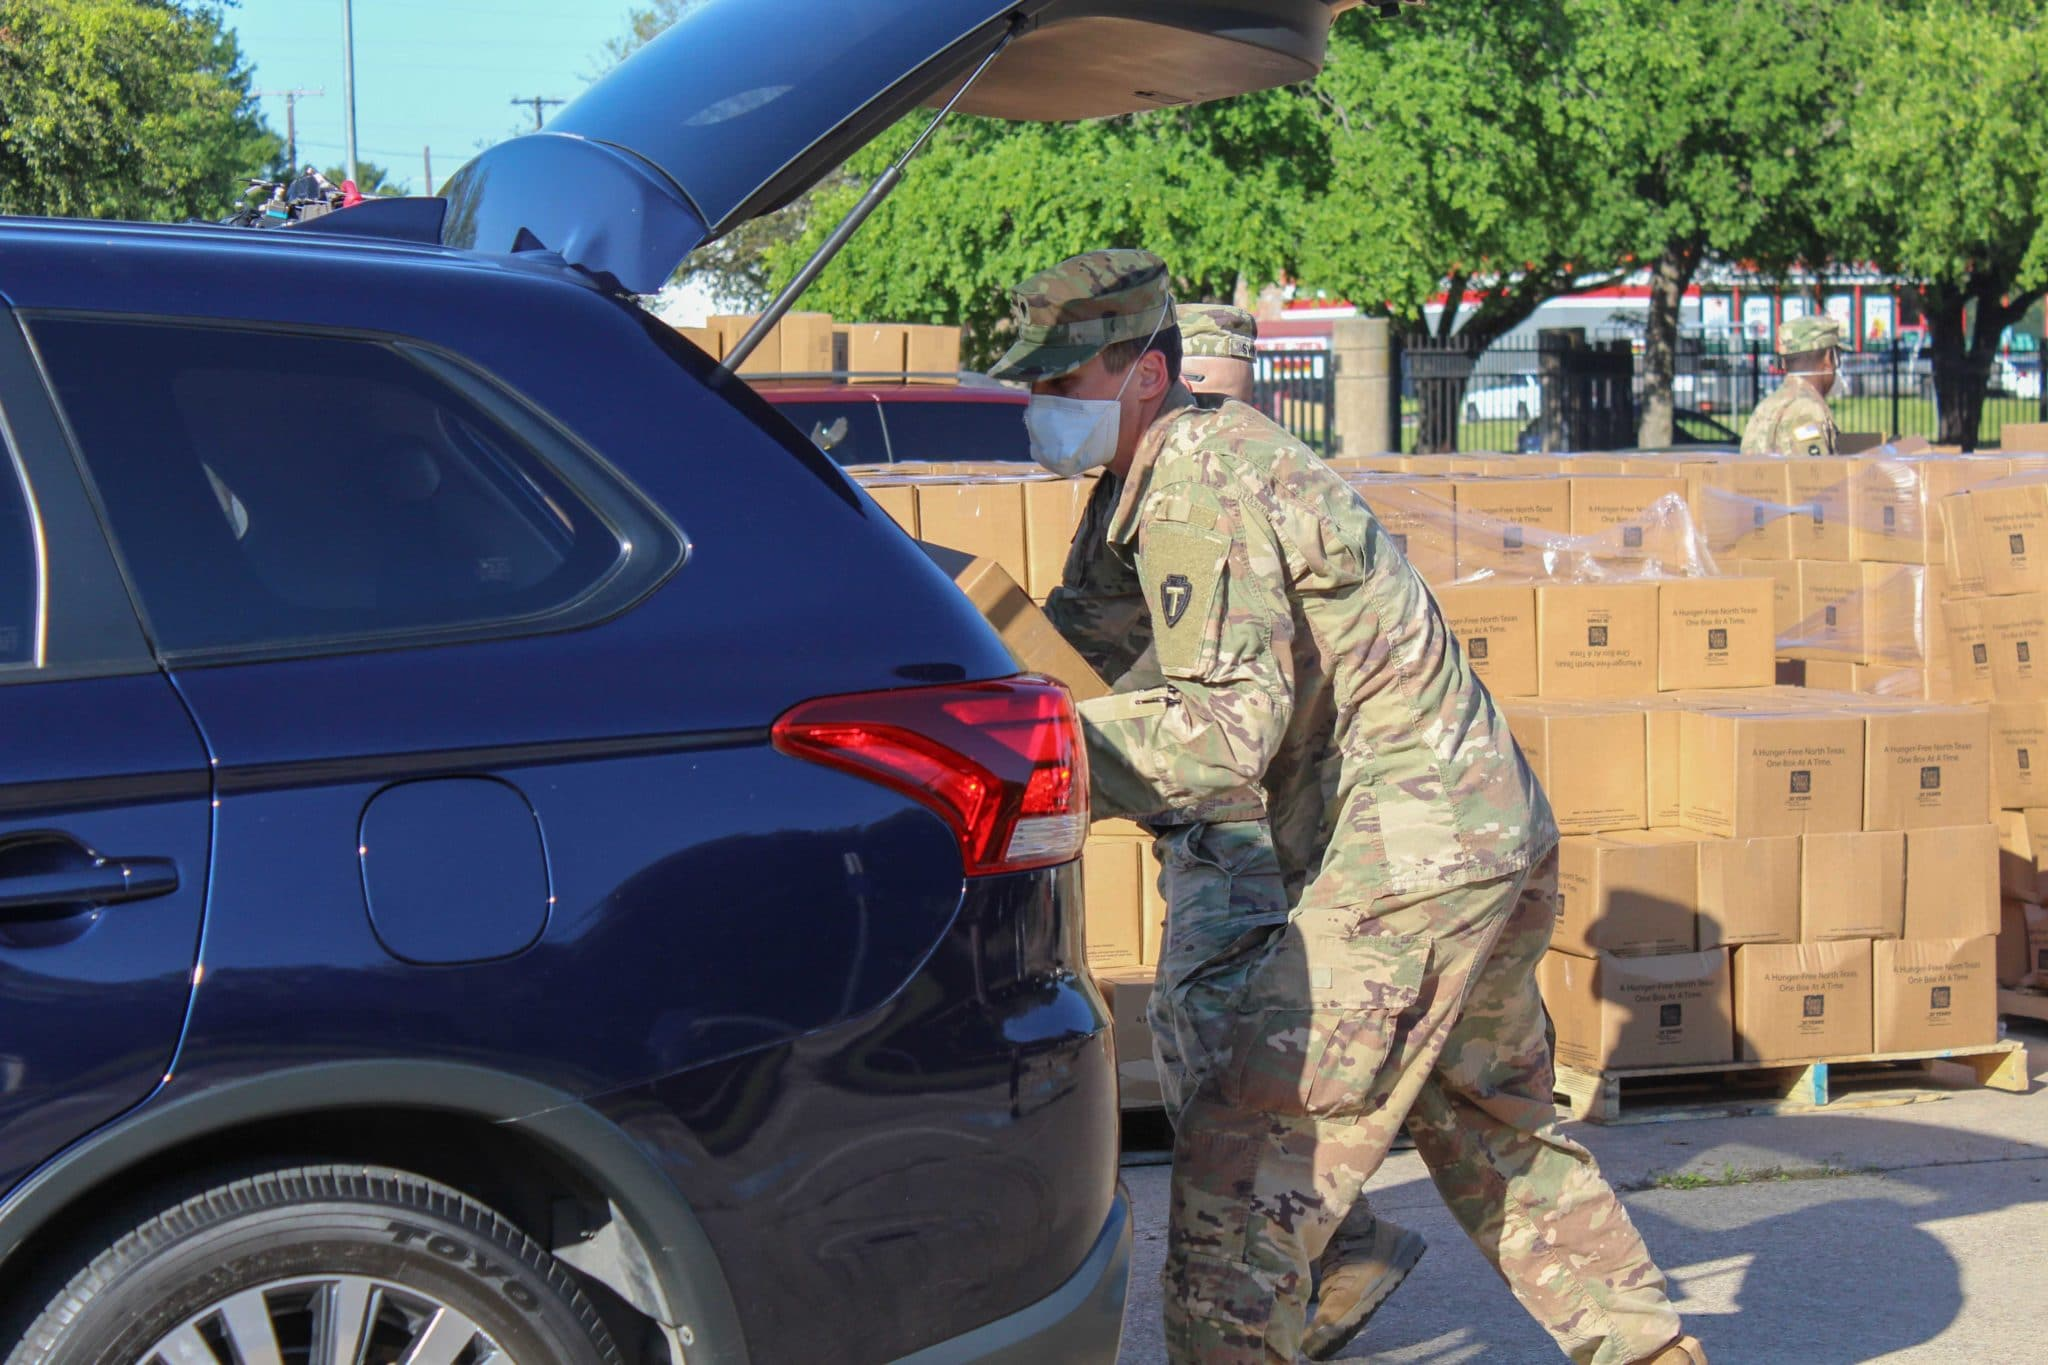 COVID Fair Park 28 National Guard Loading Car